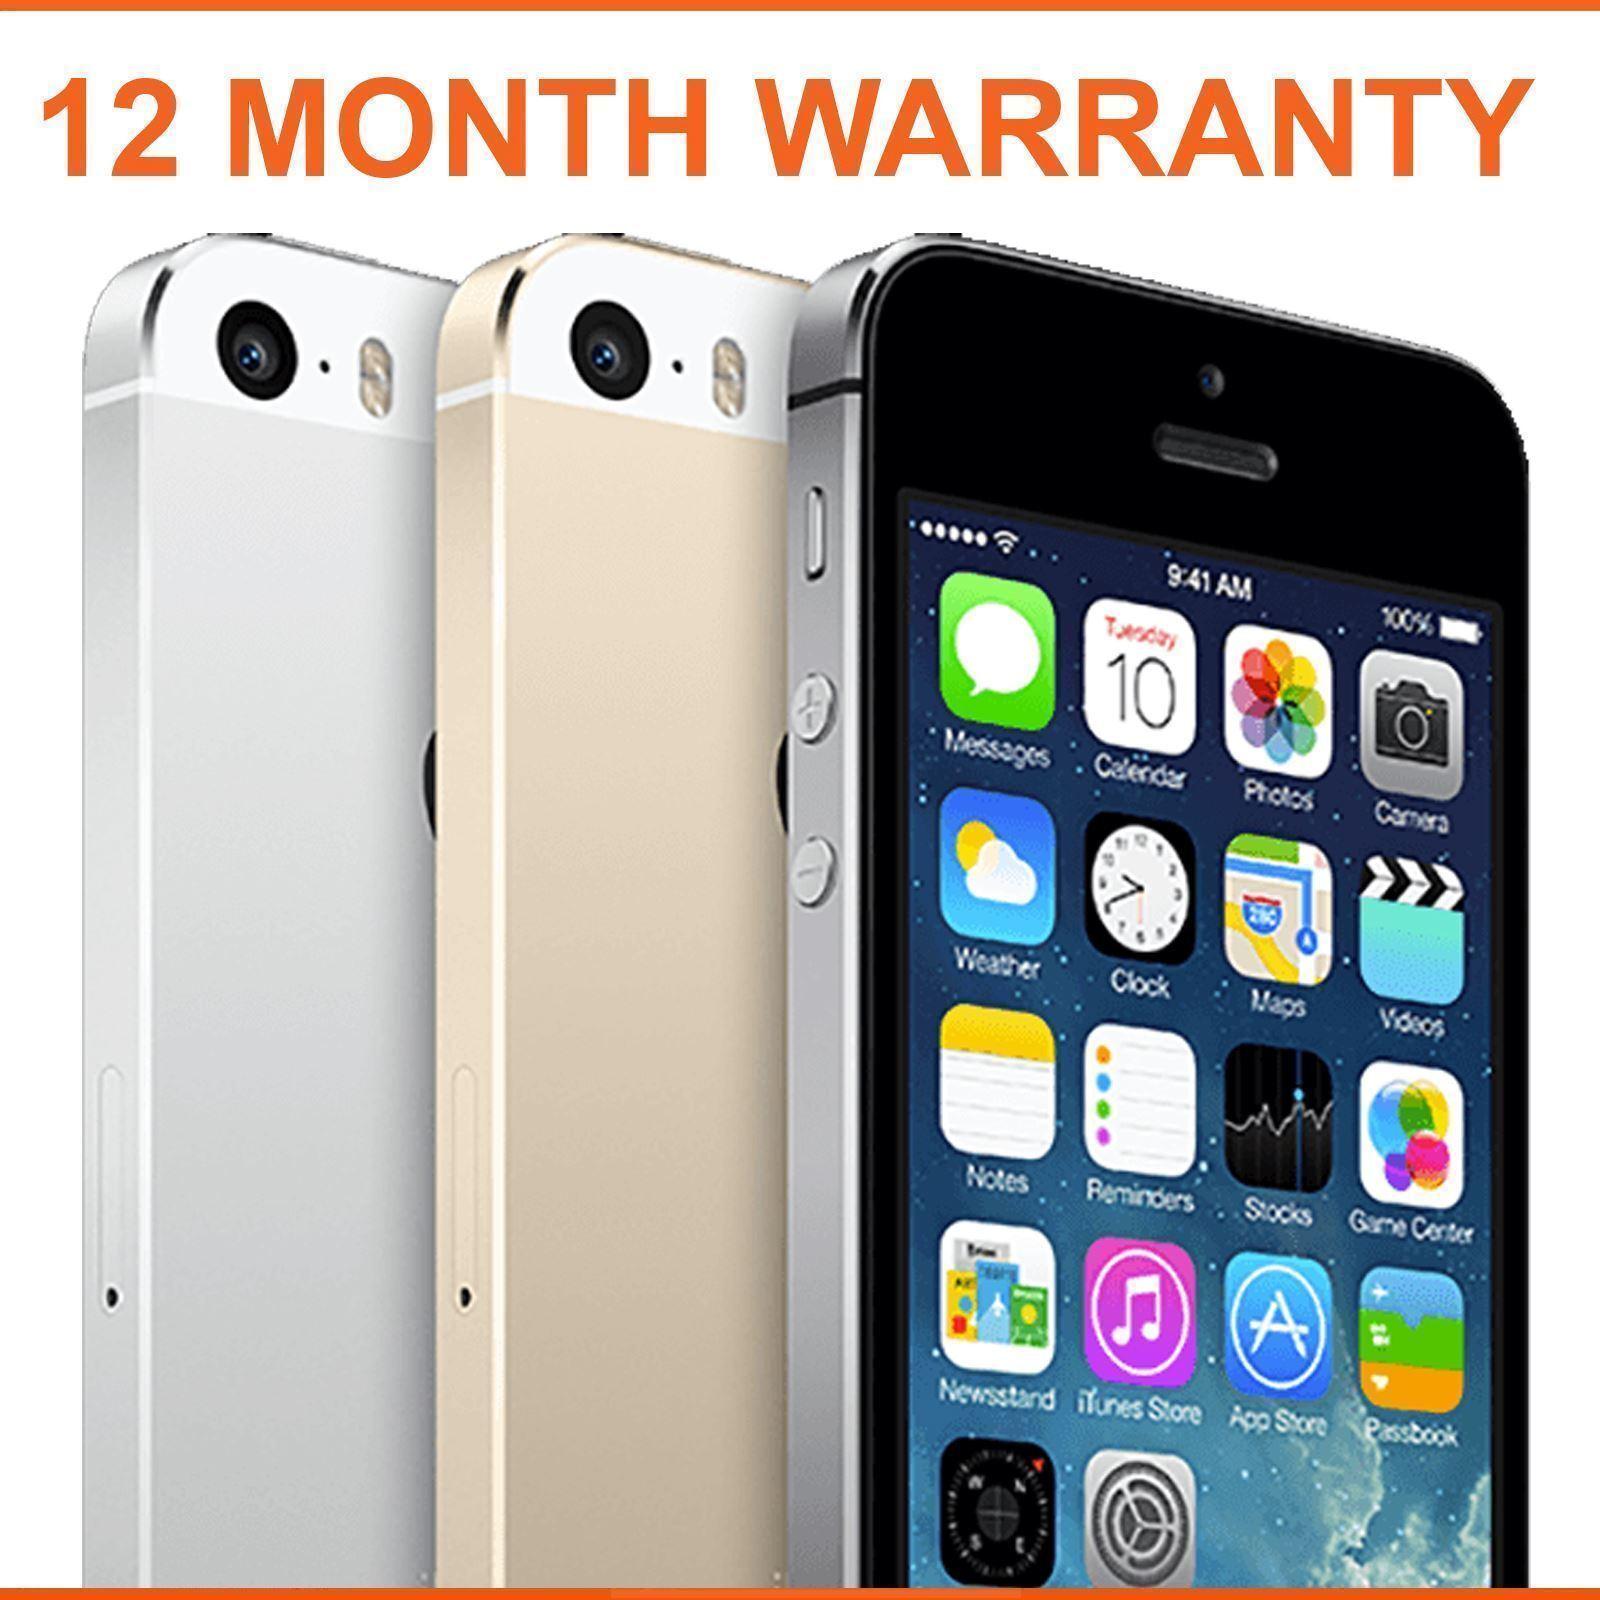 SELLER REFURBISHED APPLE IPHONE 5S 16GB 32GB 64GB SPACE GREY SILVER GOLD UNLOCKED SMARTPHONE